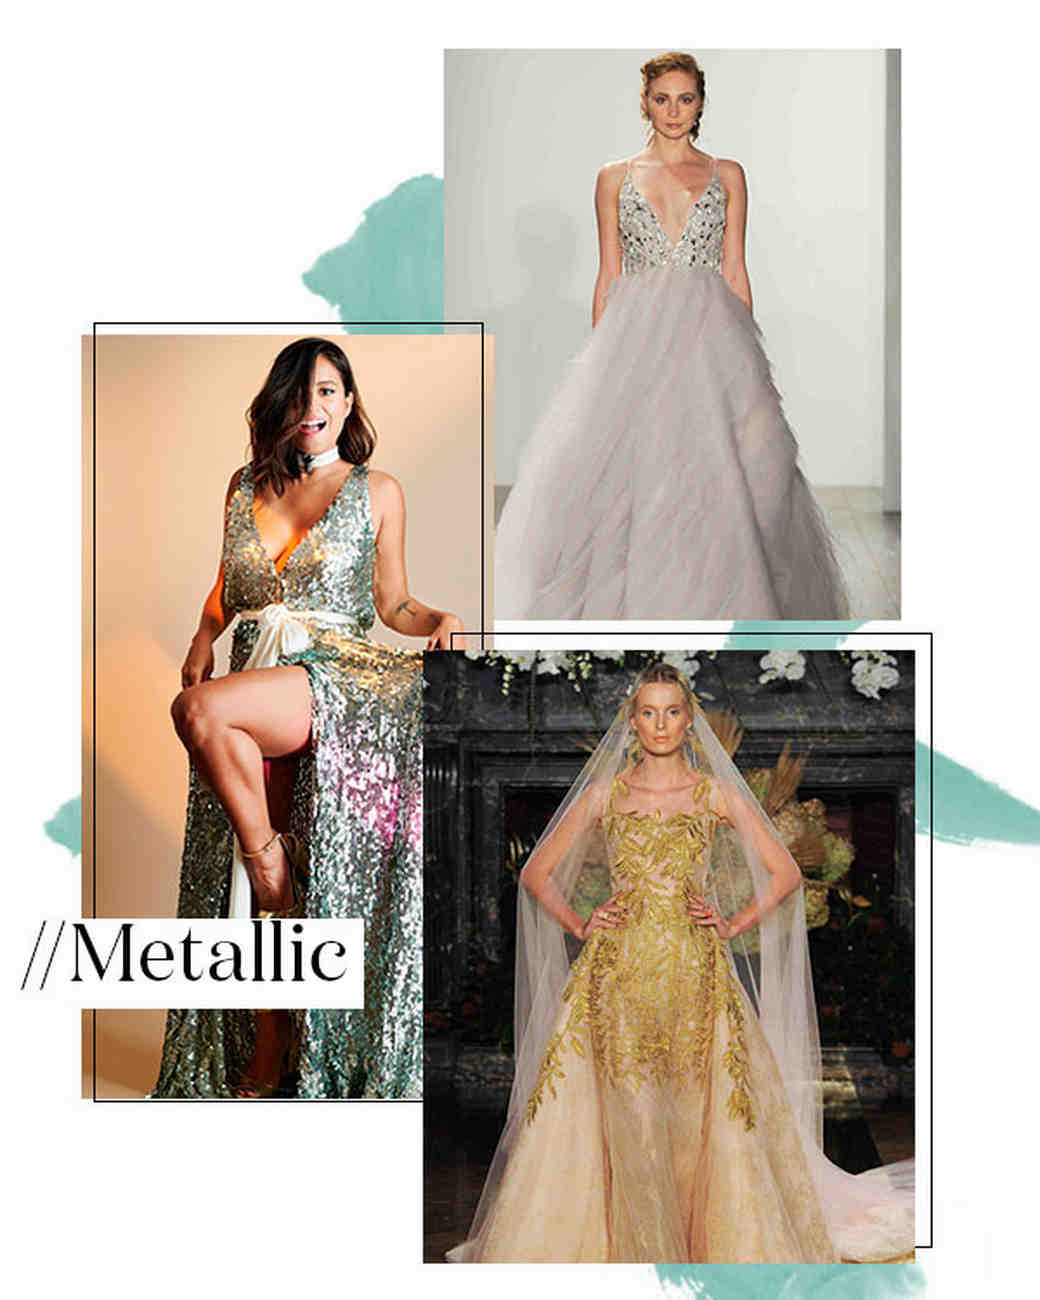 Fall 2017 Wedding Dress Trend: Metallic